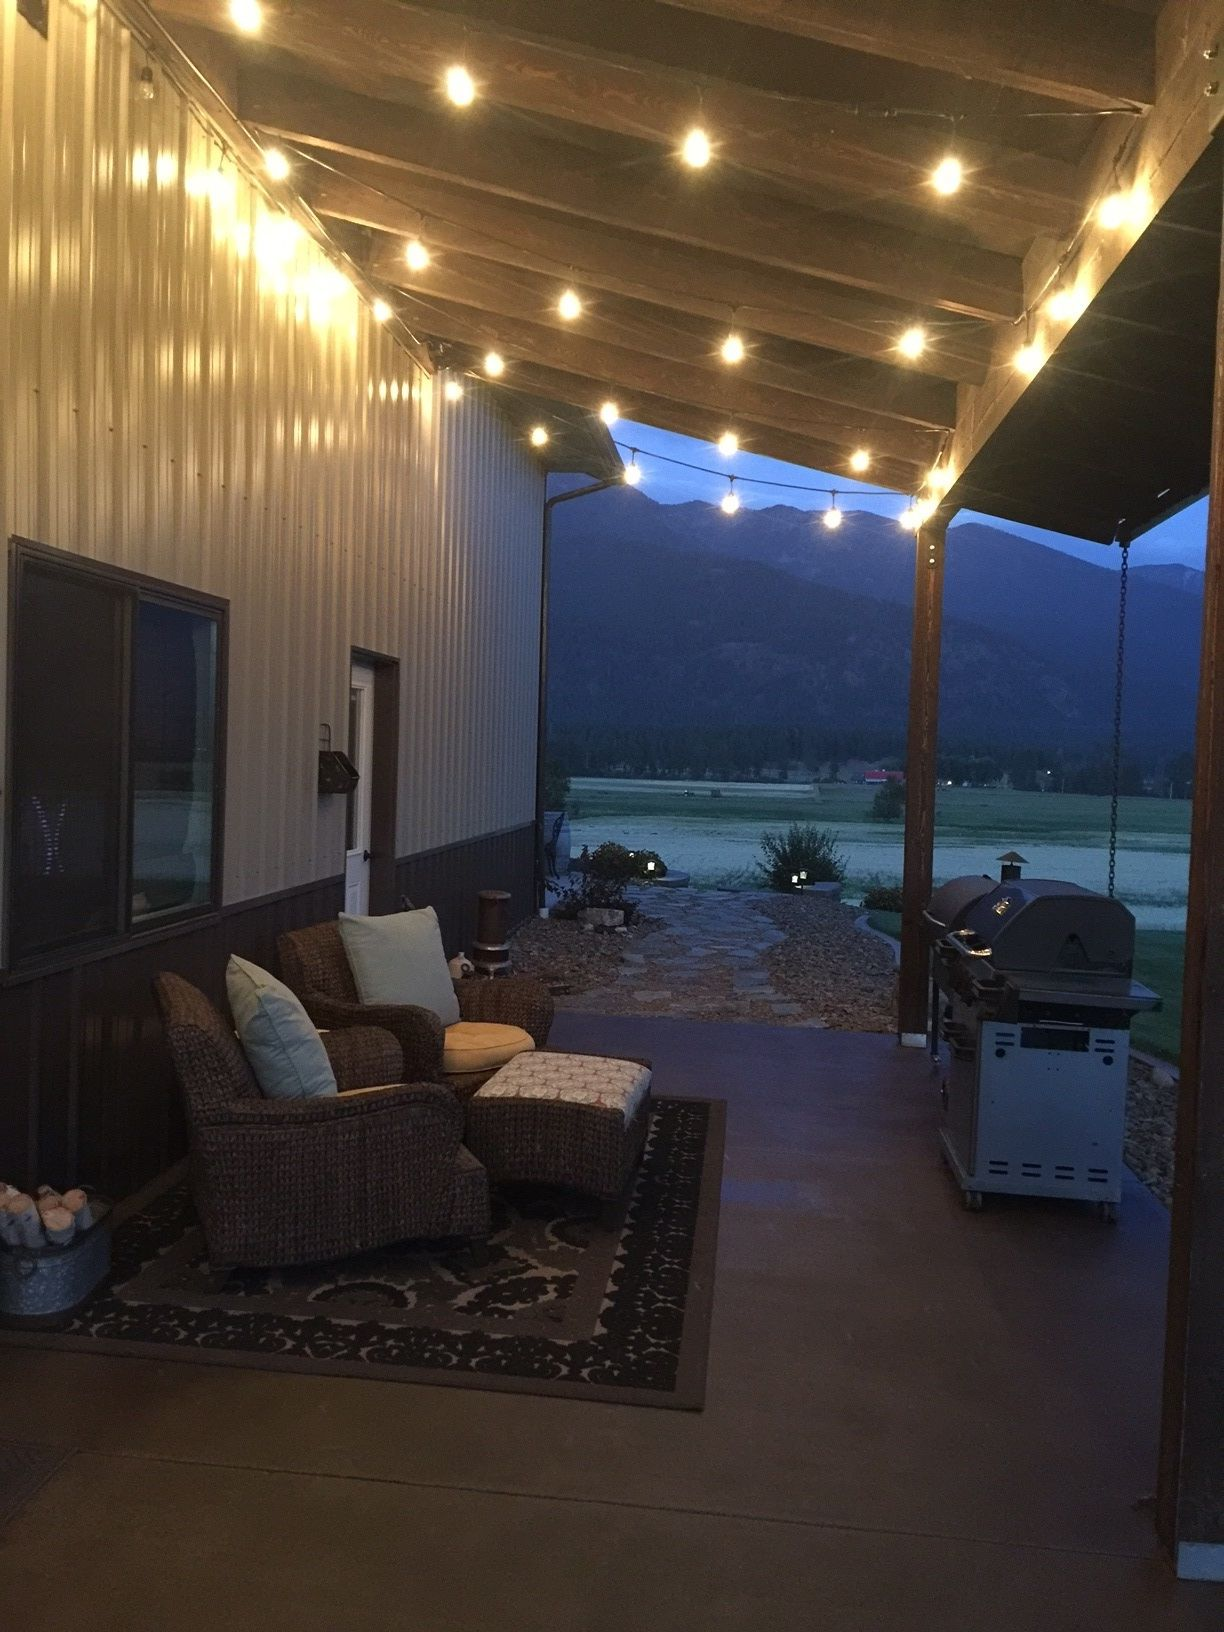 Pole Barn Shop Interior Ideas : interior, ideas, Style, Concrete, Patio, Direct, Colors, Barn,, Building, Homes